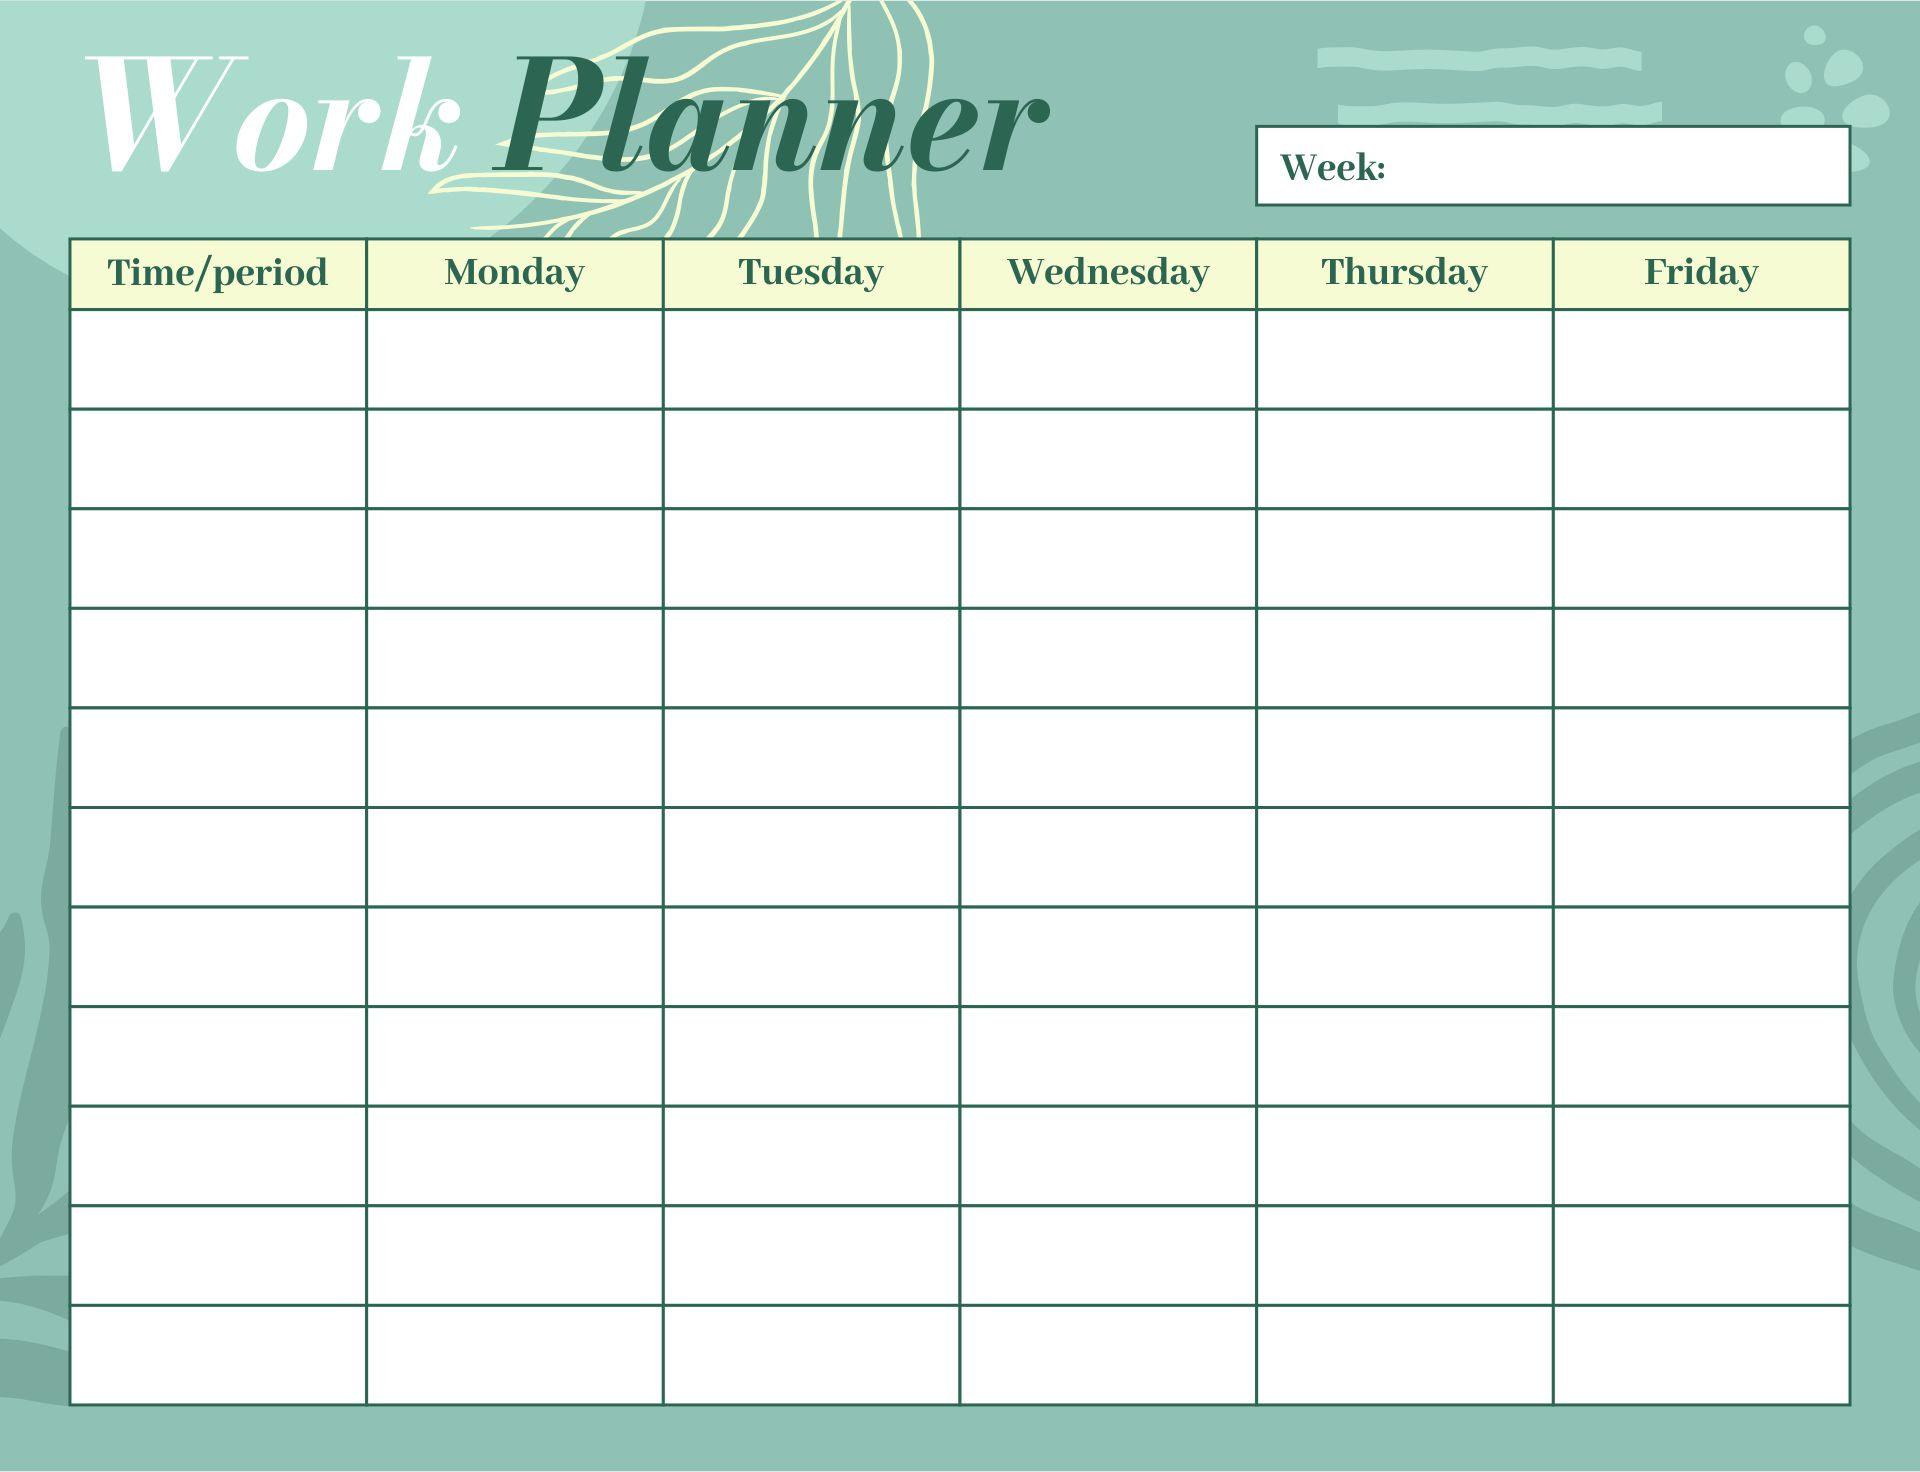 7 Best Images of 5 Day Work Week Monthly Calendar Printable - 5 ...